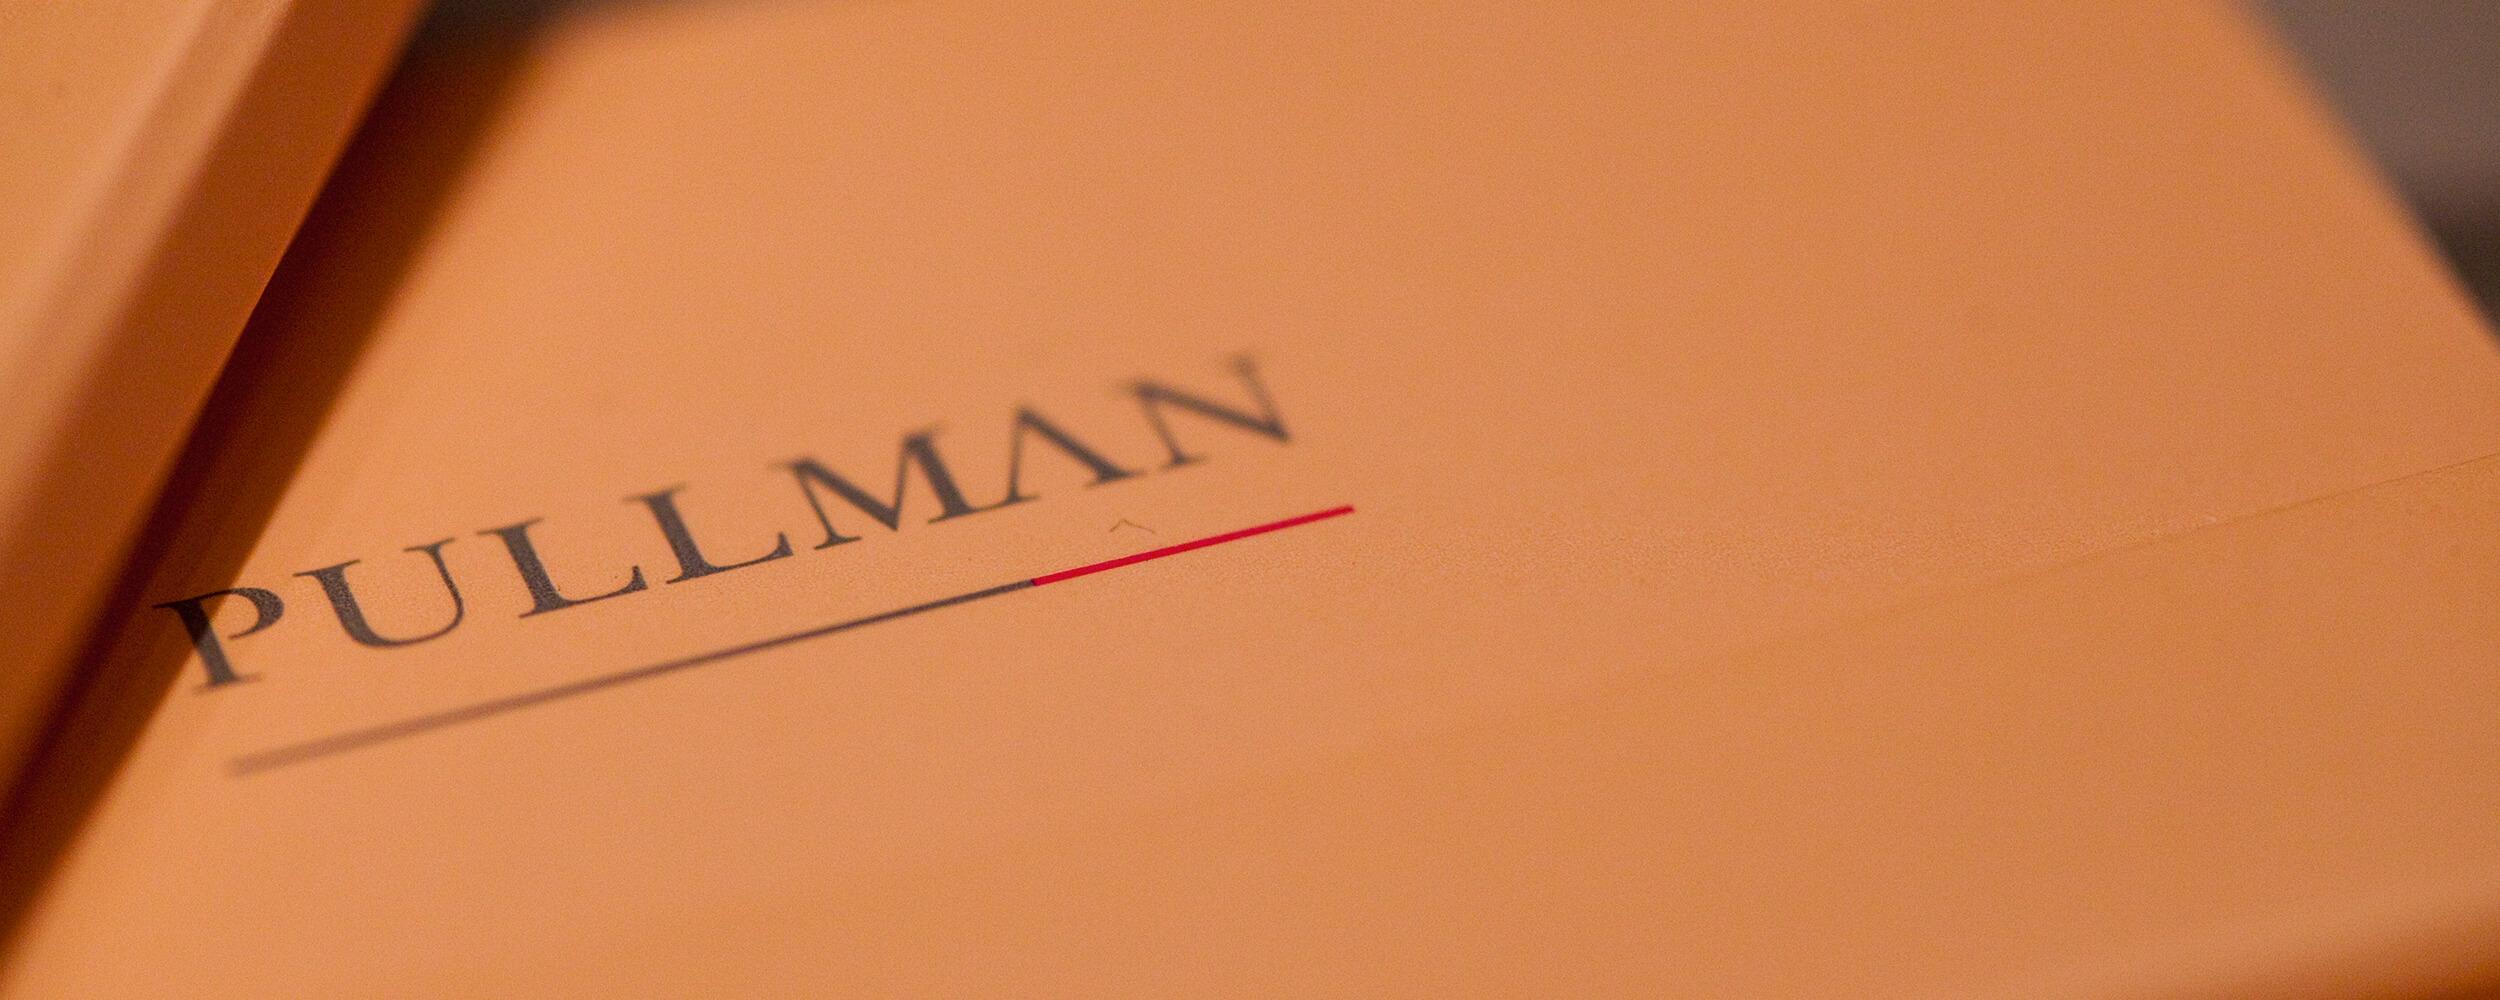 Pullman, logo